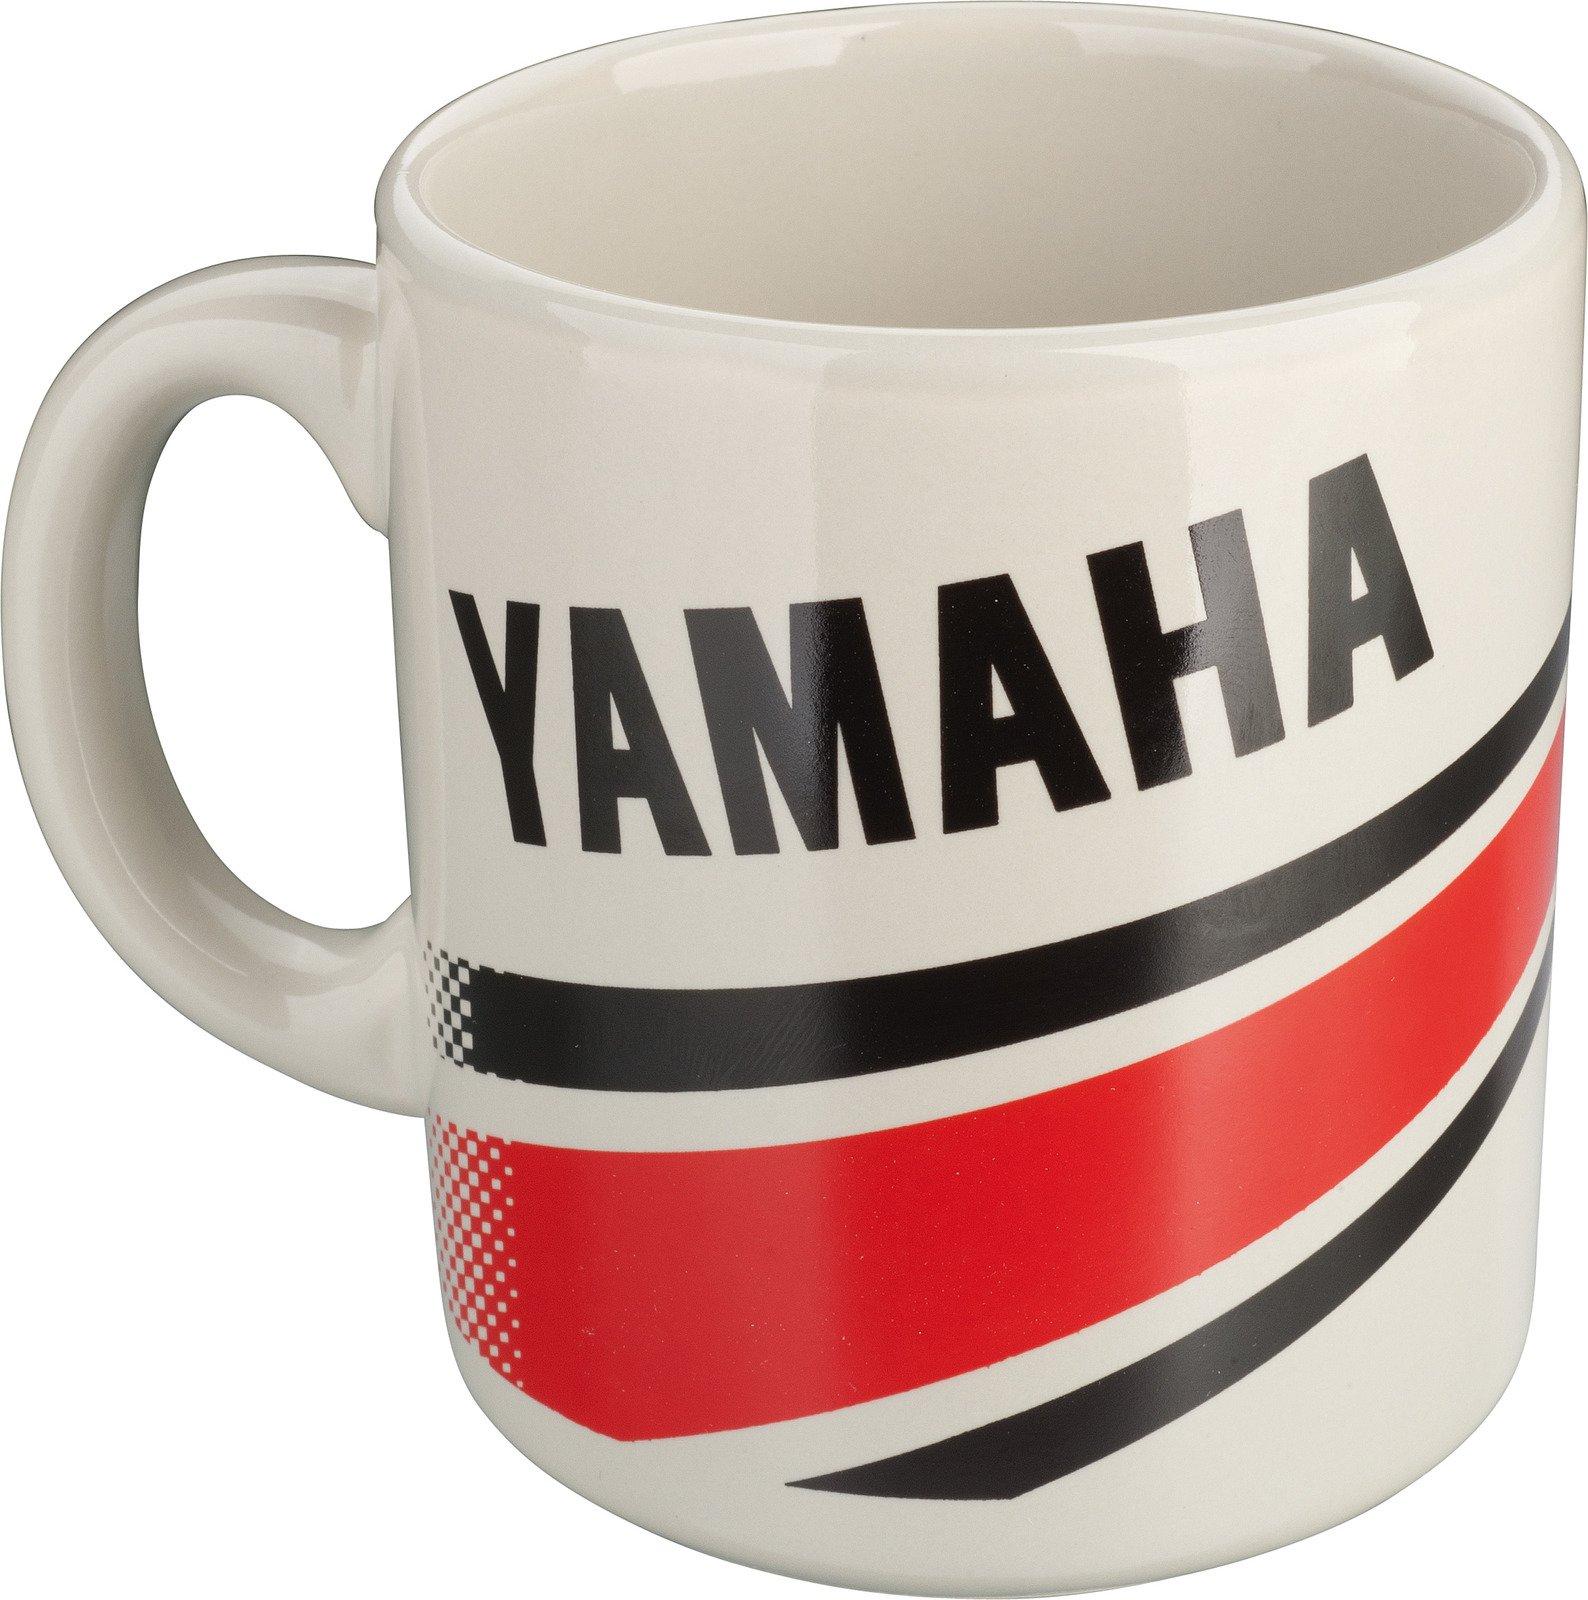 Yamaha Coffee Cup / Mug, 11 oz, Red / Black, YAMAHA 'Revs Your Heart'-Design, 06-013